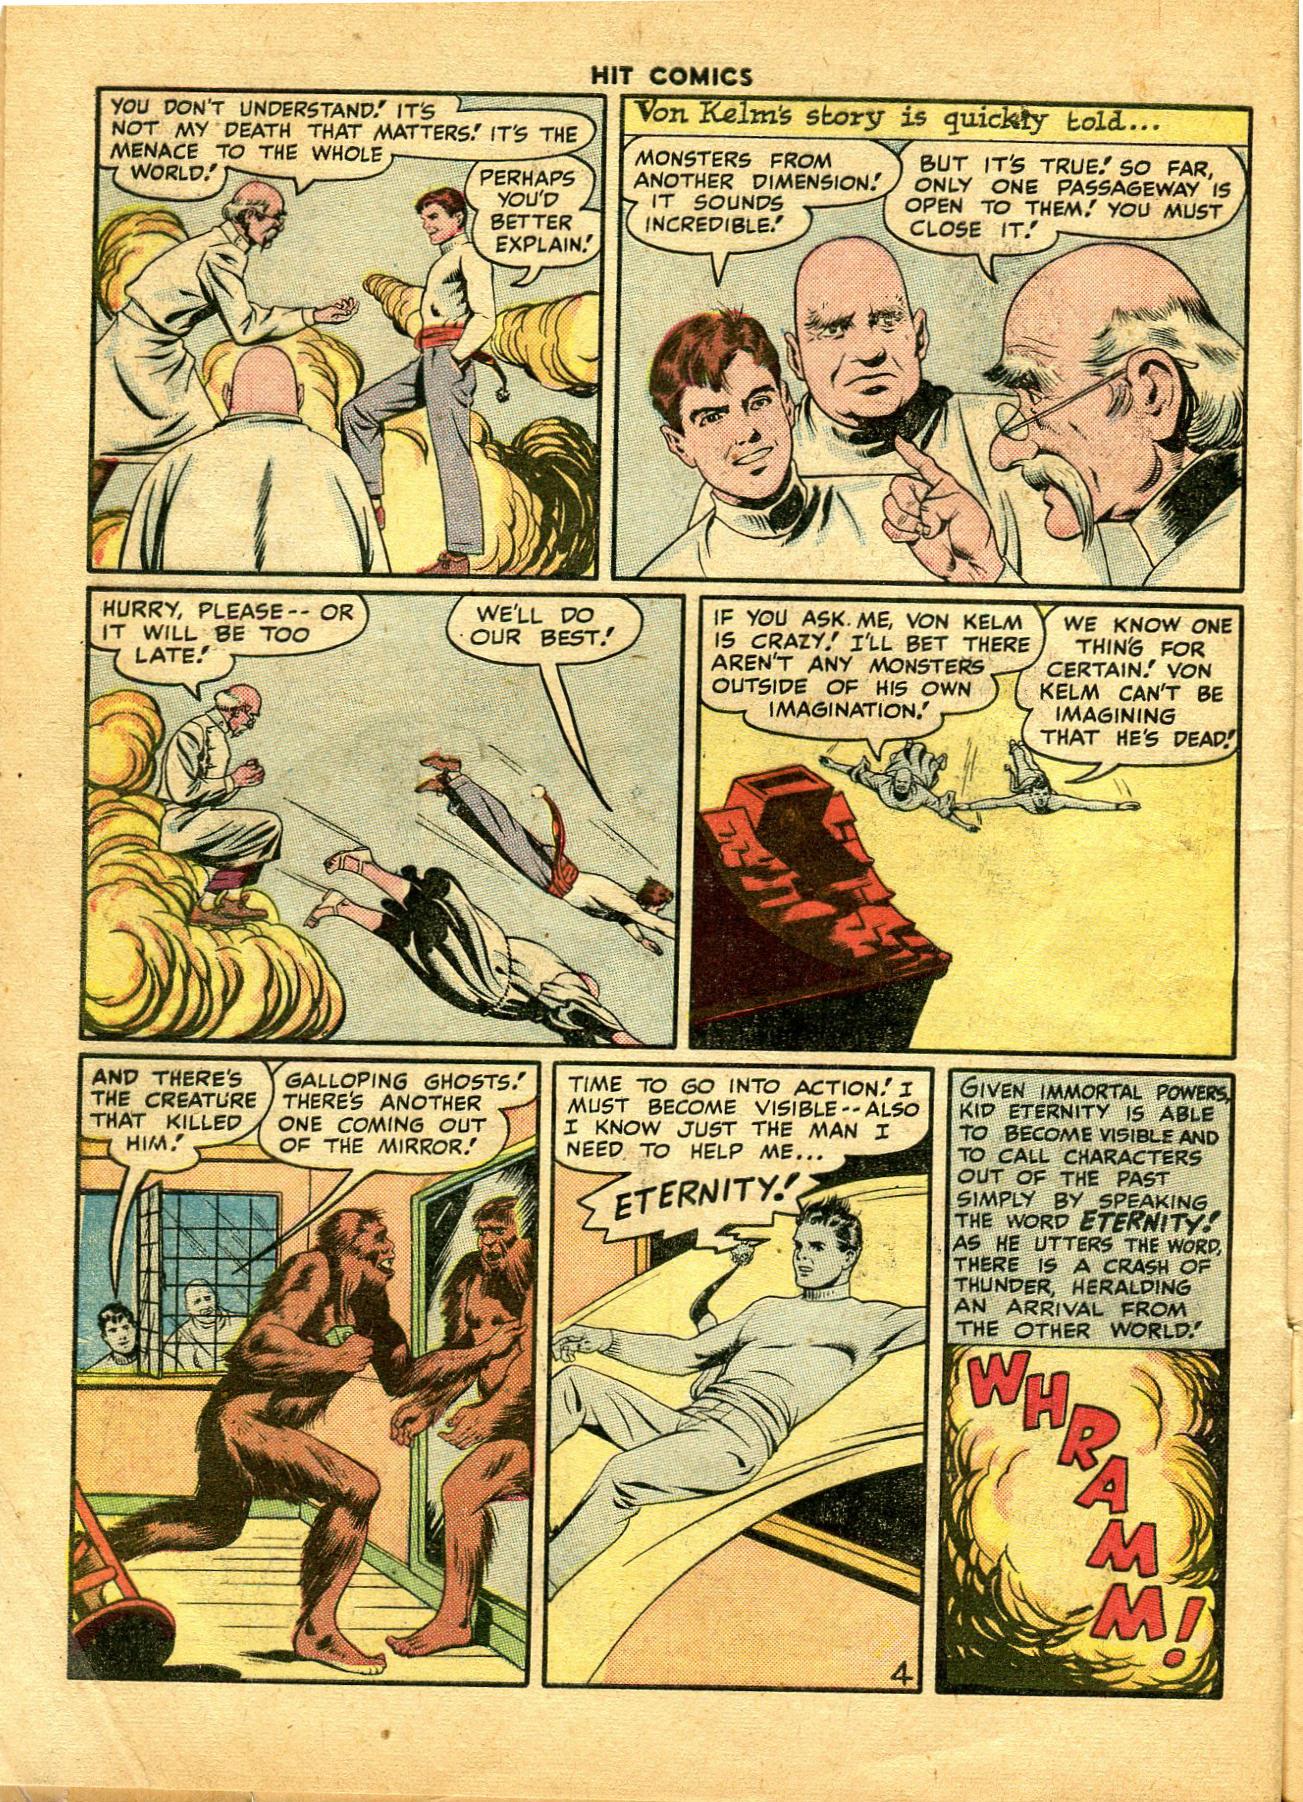 Read online Hit Comics comic -  Issue #49 - 6